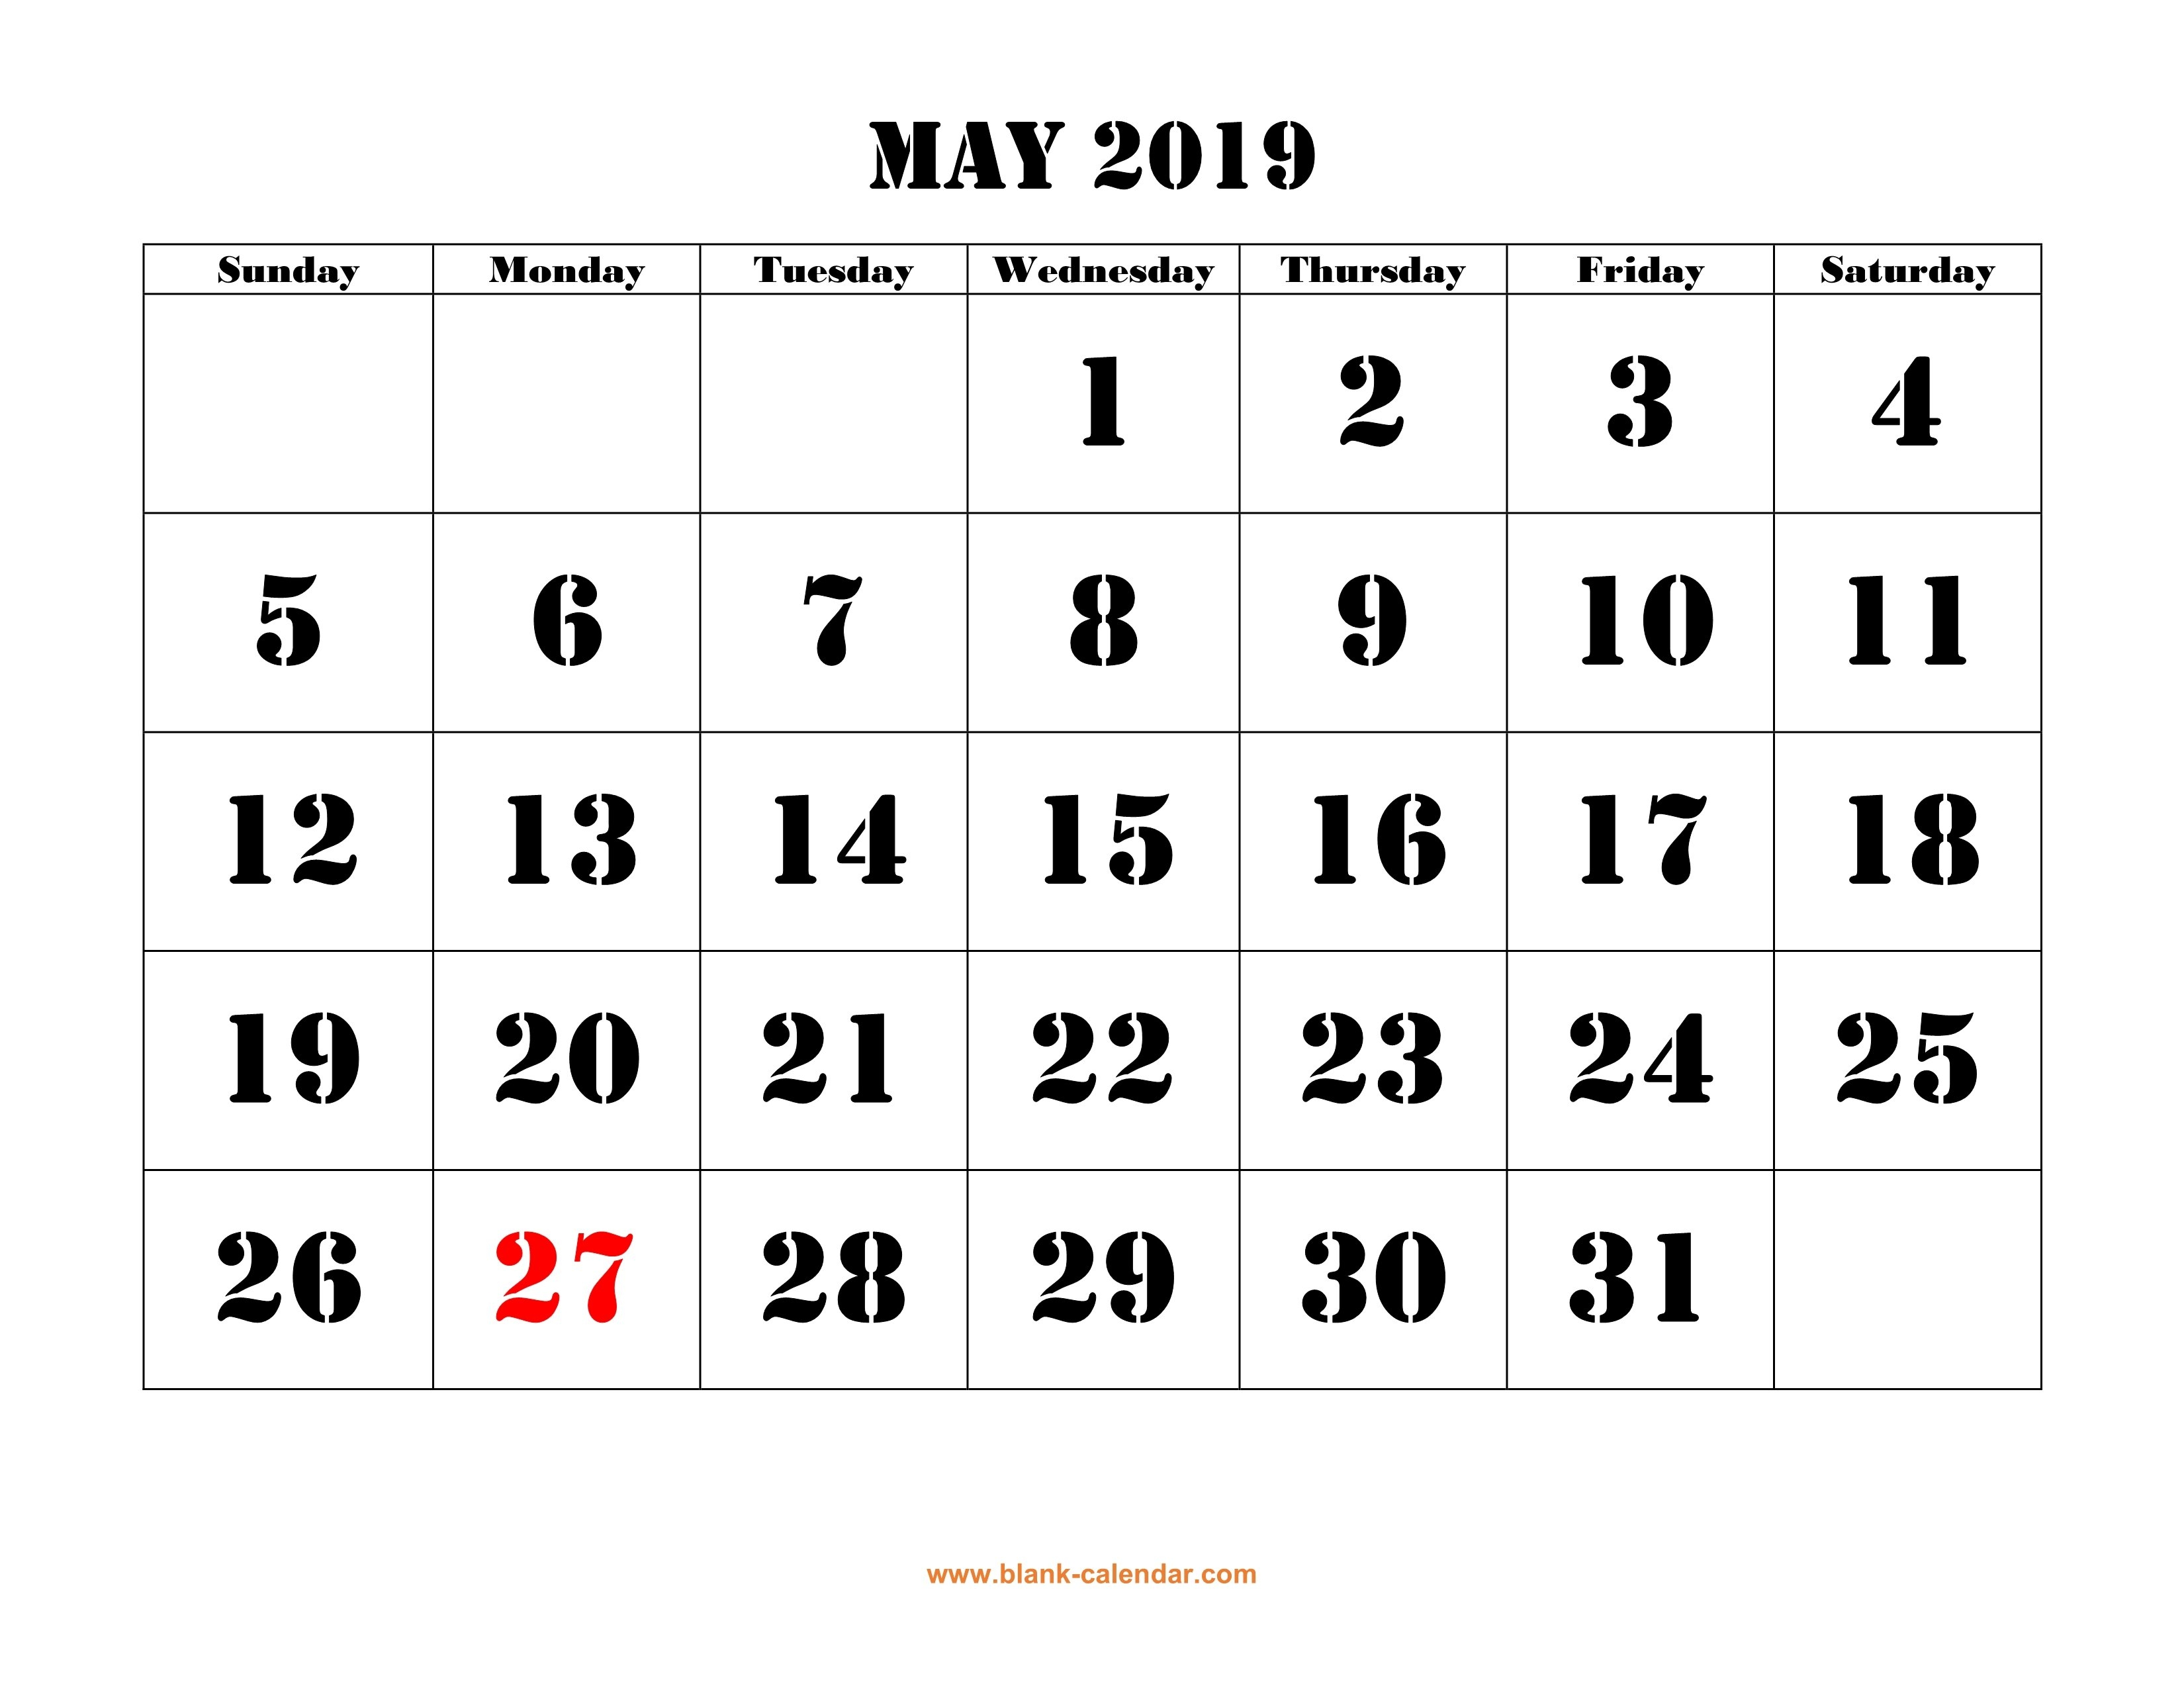 Free Download Printable May 2019 Calendar, Large Font Design May 6 2019 Calendar